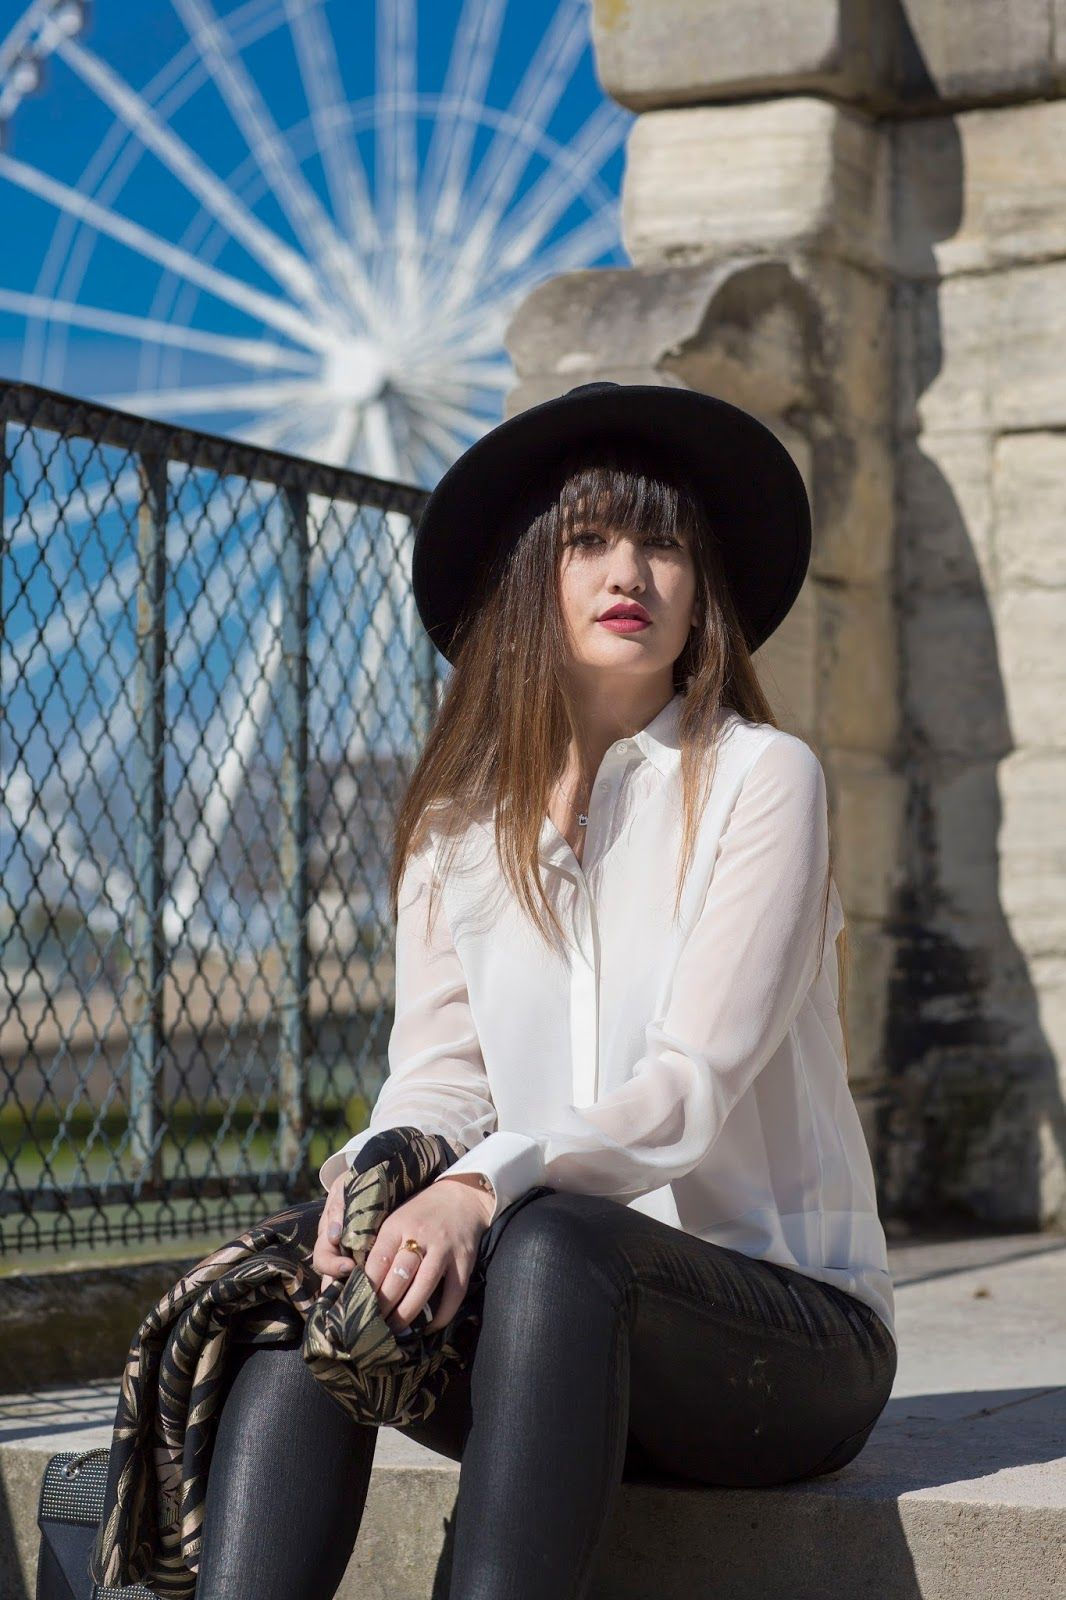 meet me in paree, blogger, fashion, look, style, parisian, nikita wong, chic style, fashion photography